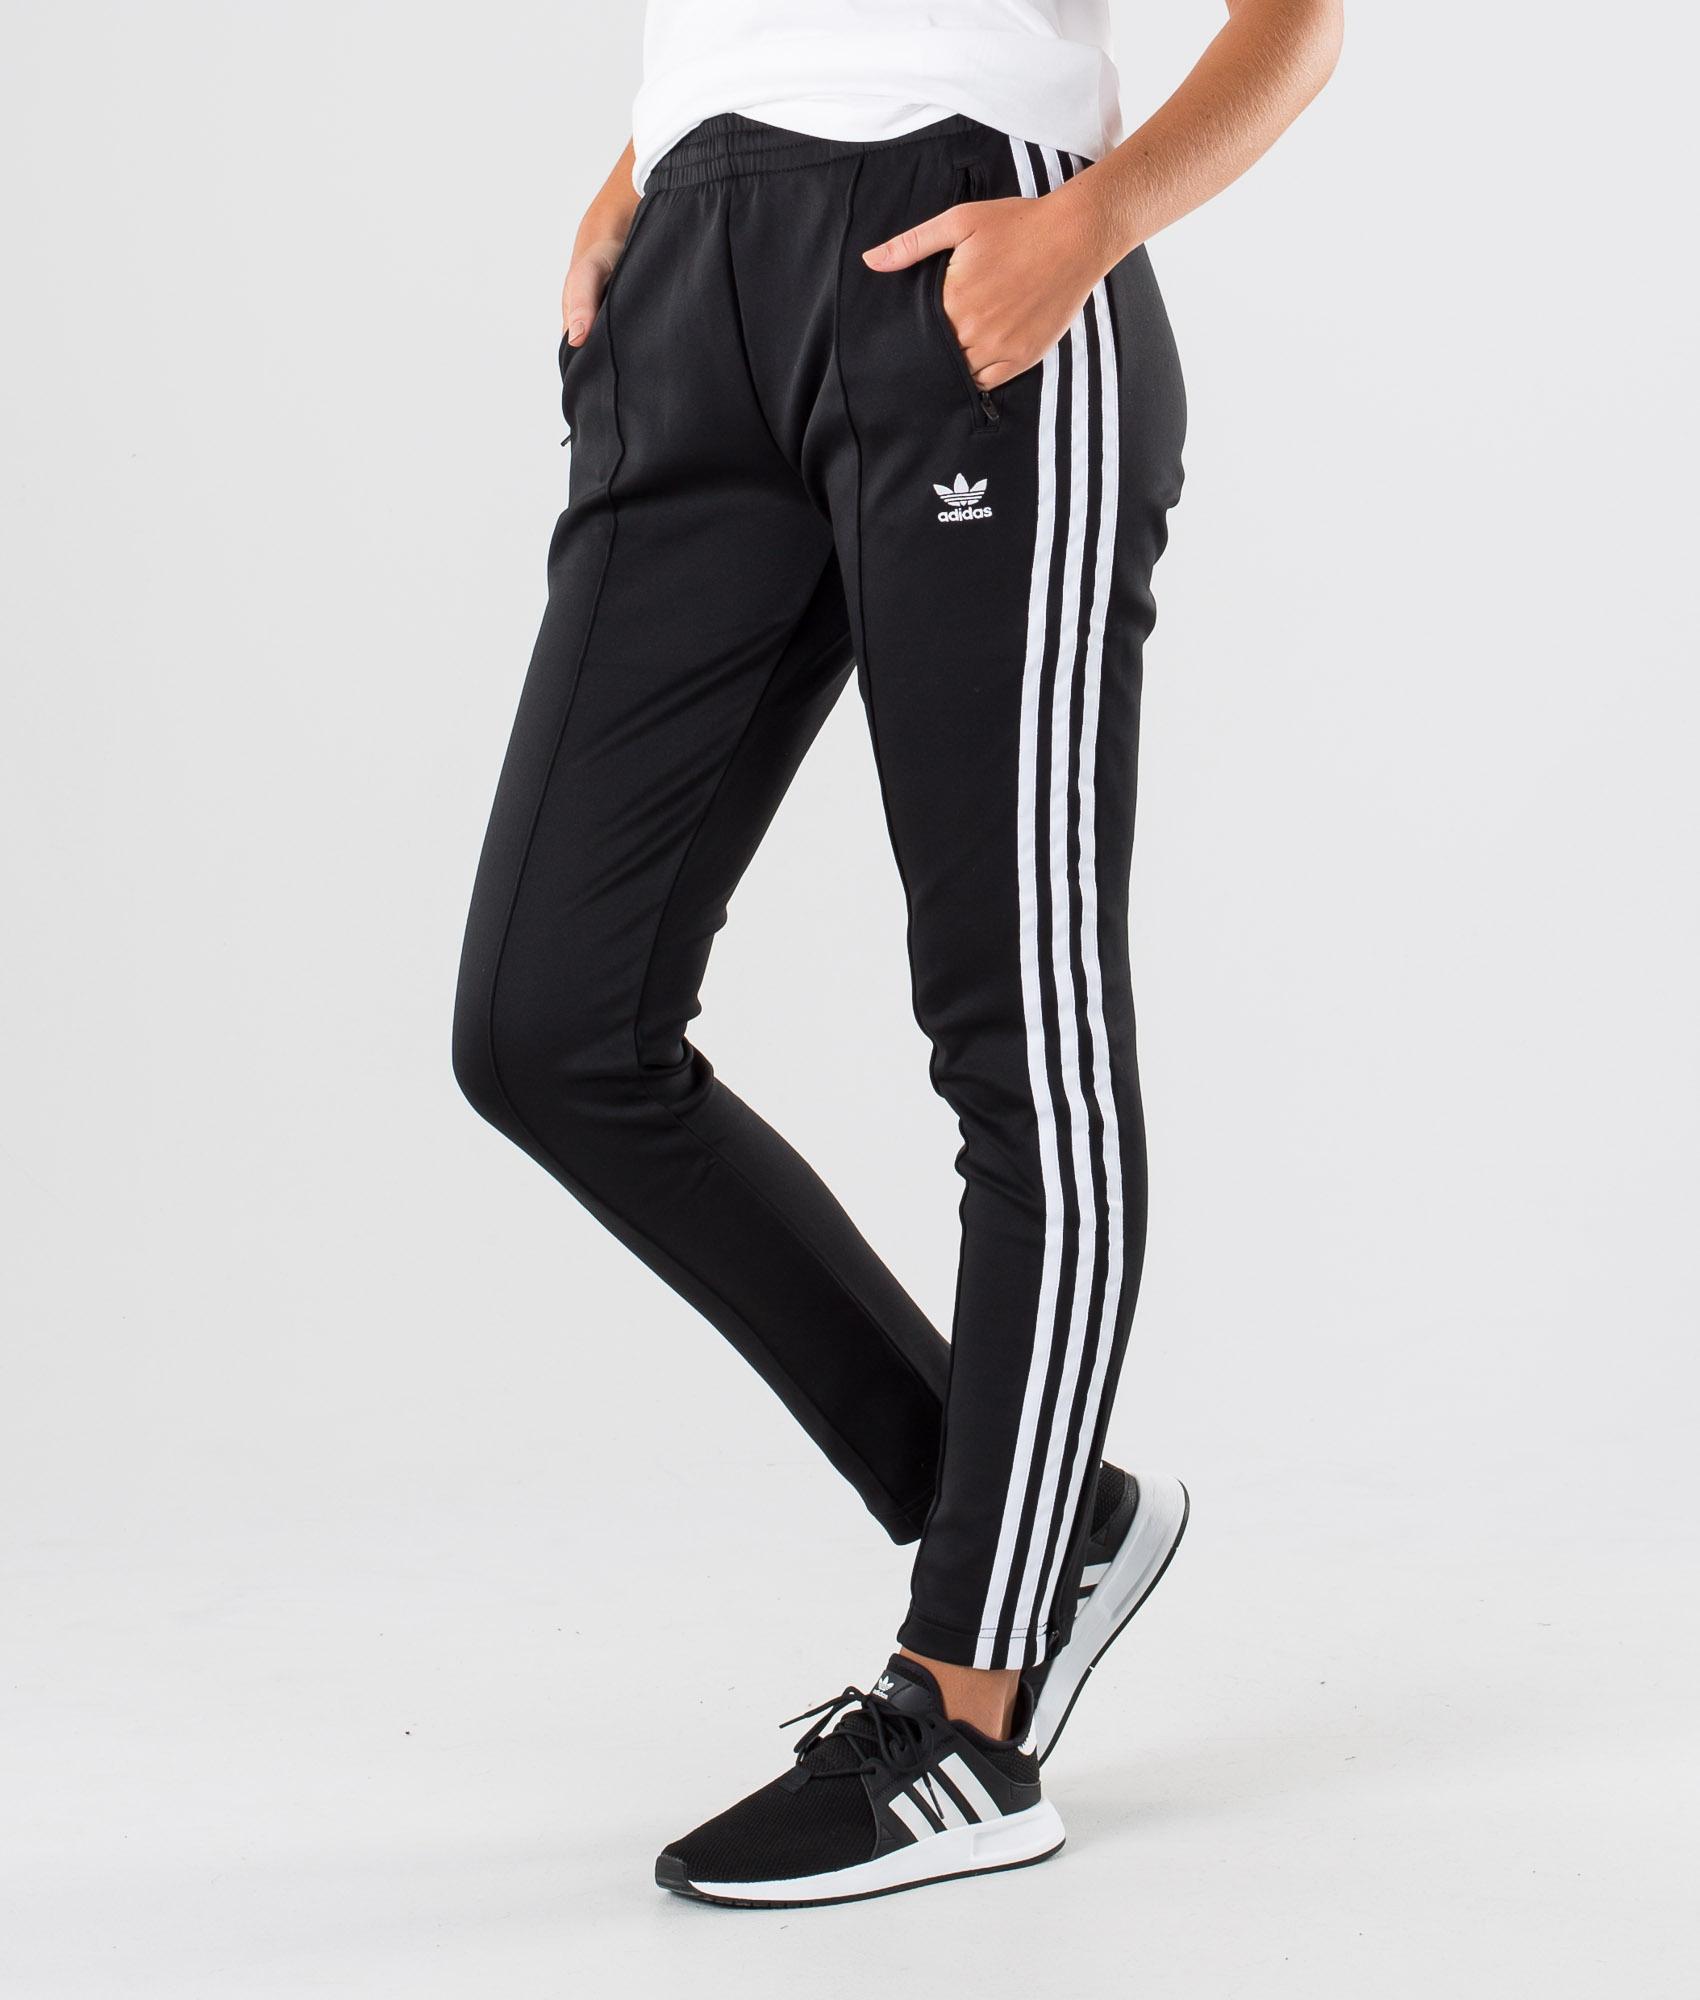 Adidas Originals Ss Track Pants Bukser BlackWhite